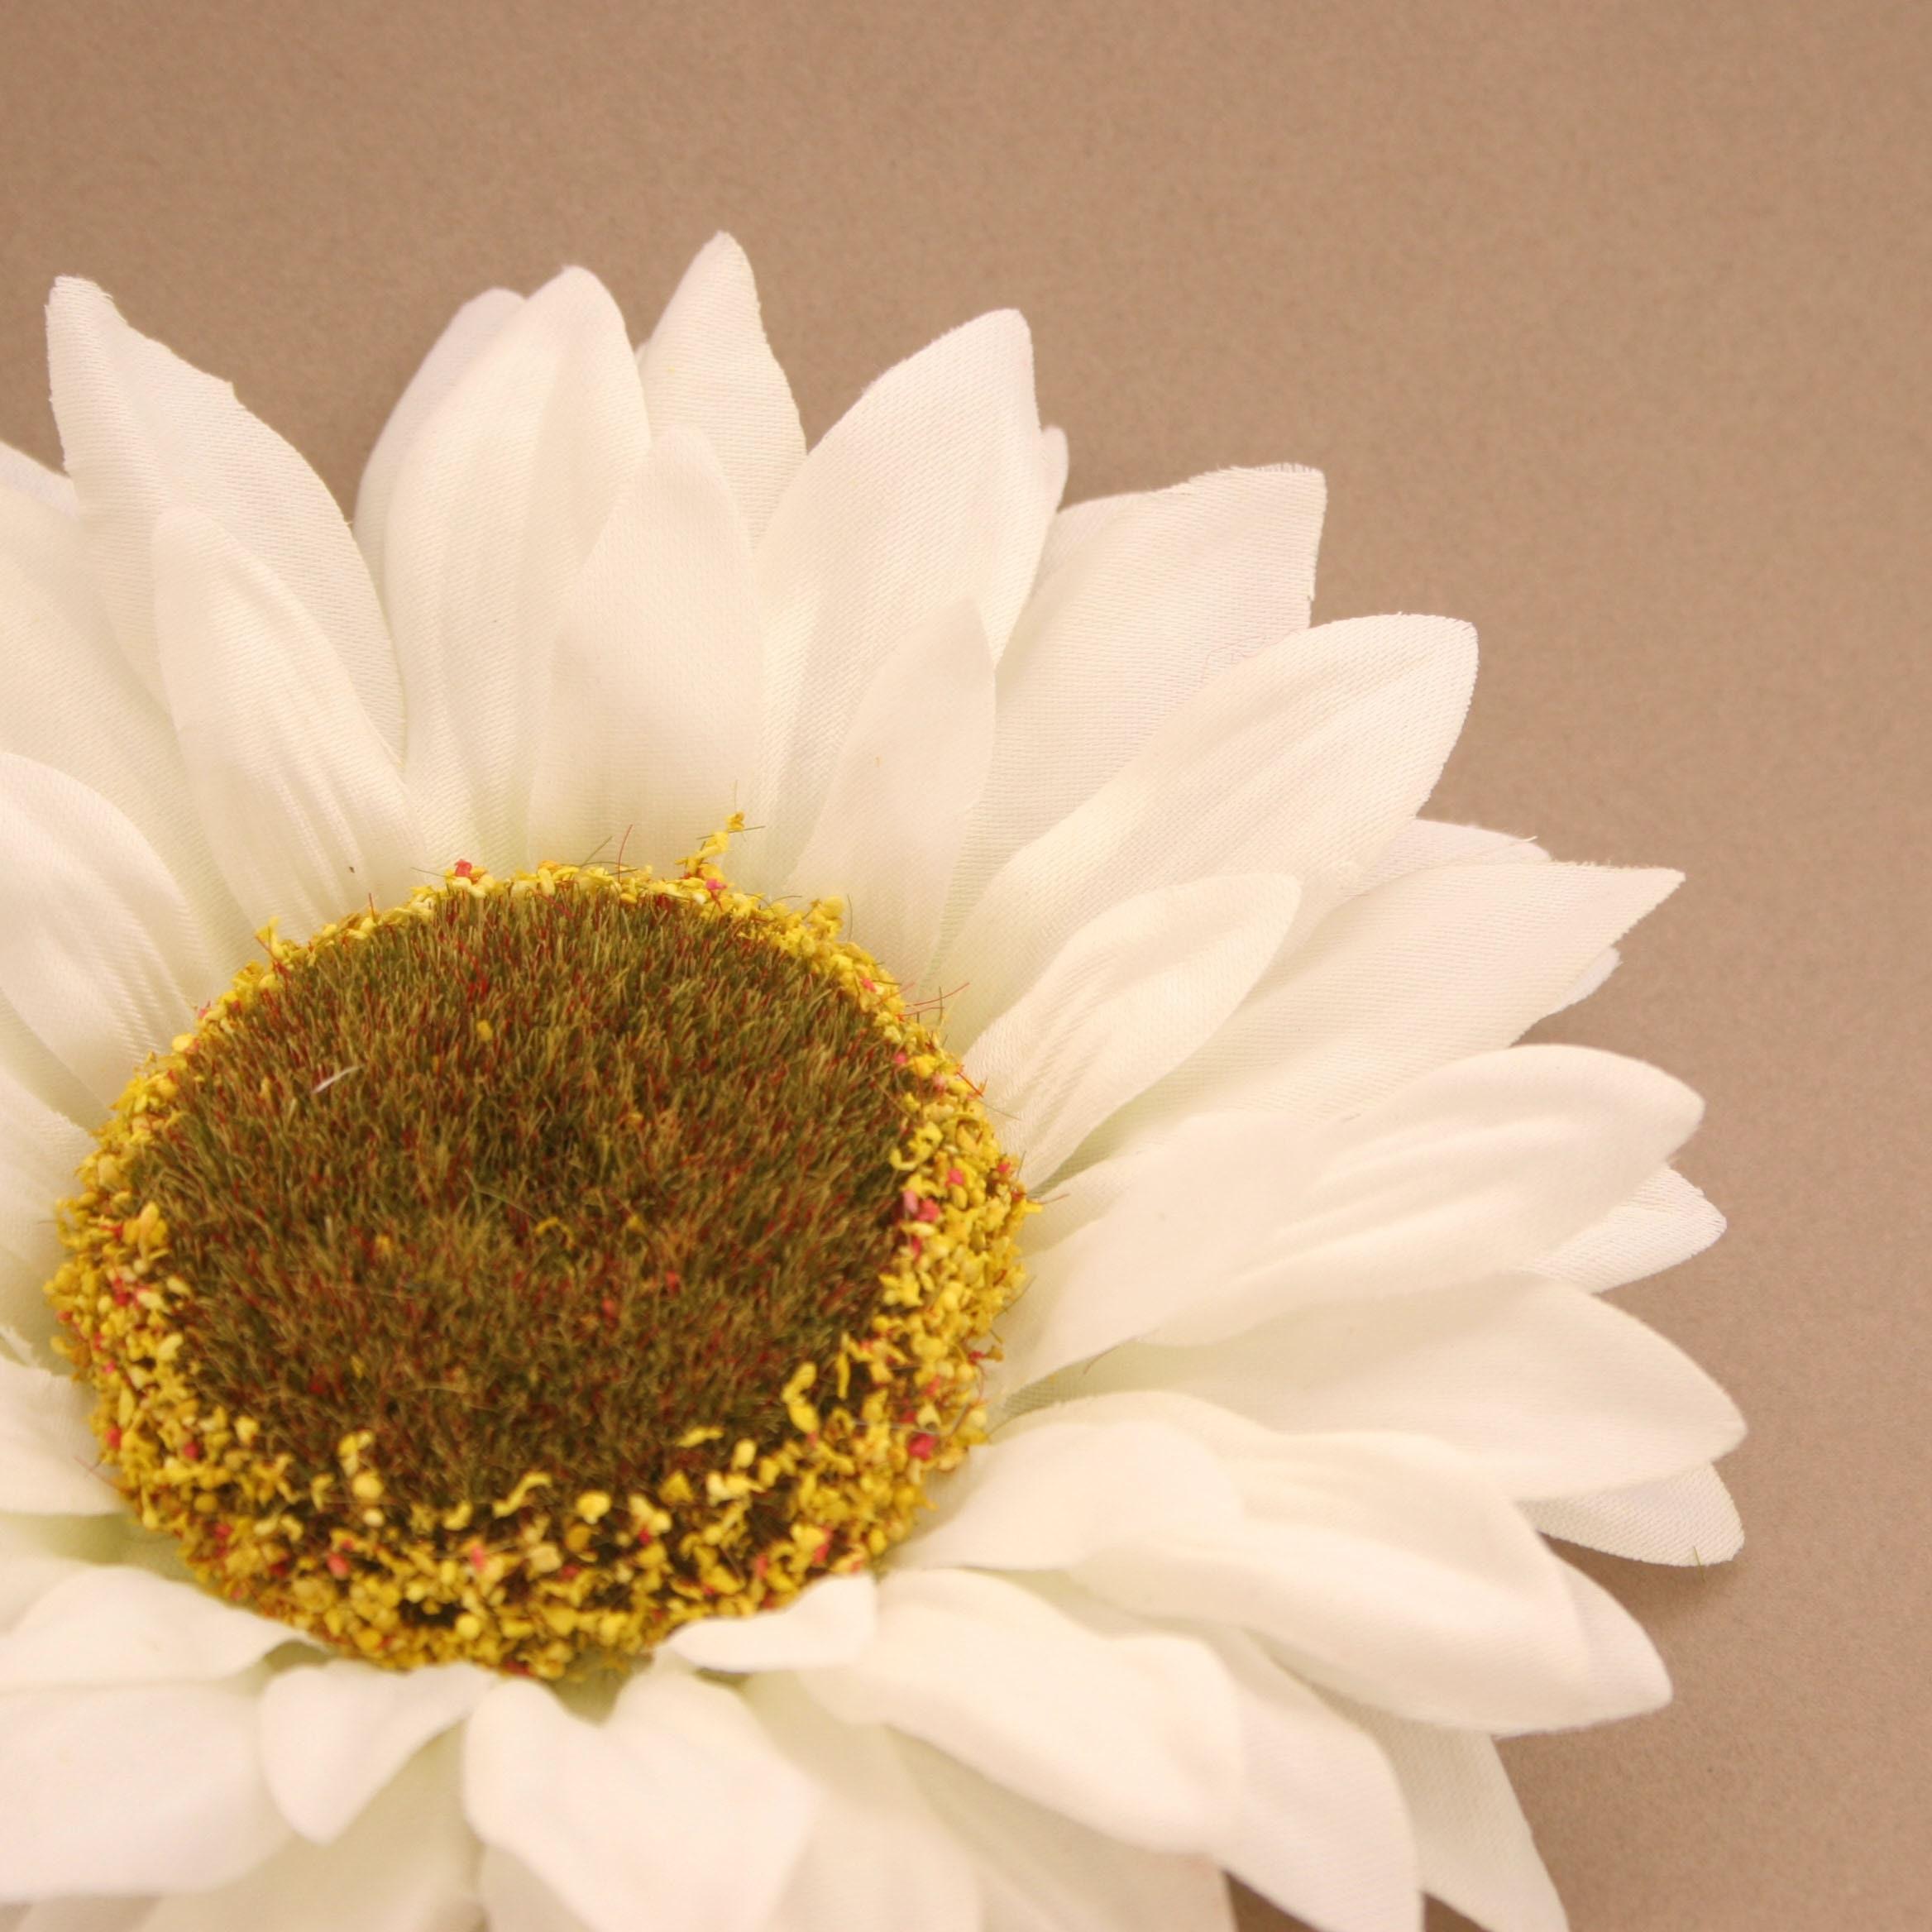 Large Cream White Sunflower Artificial Flowers Silk Flower